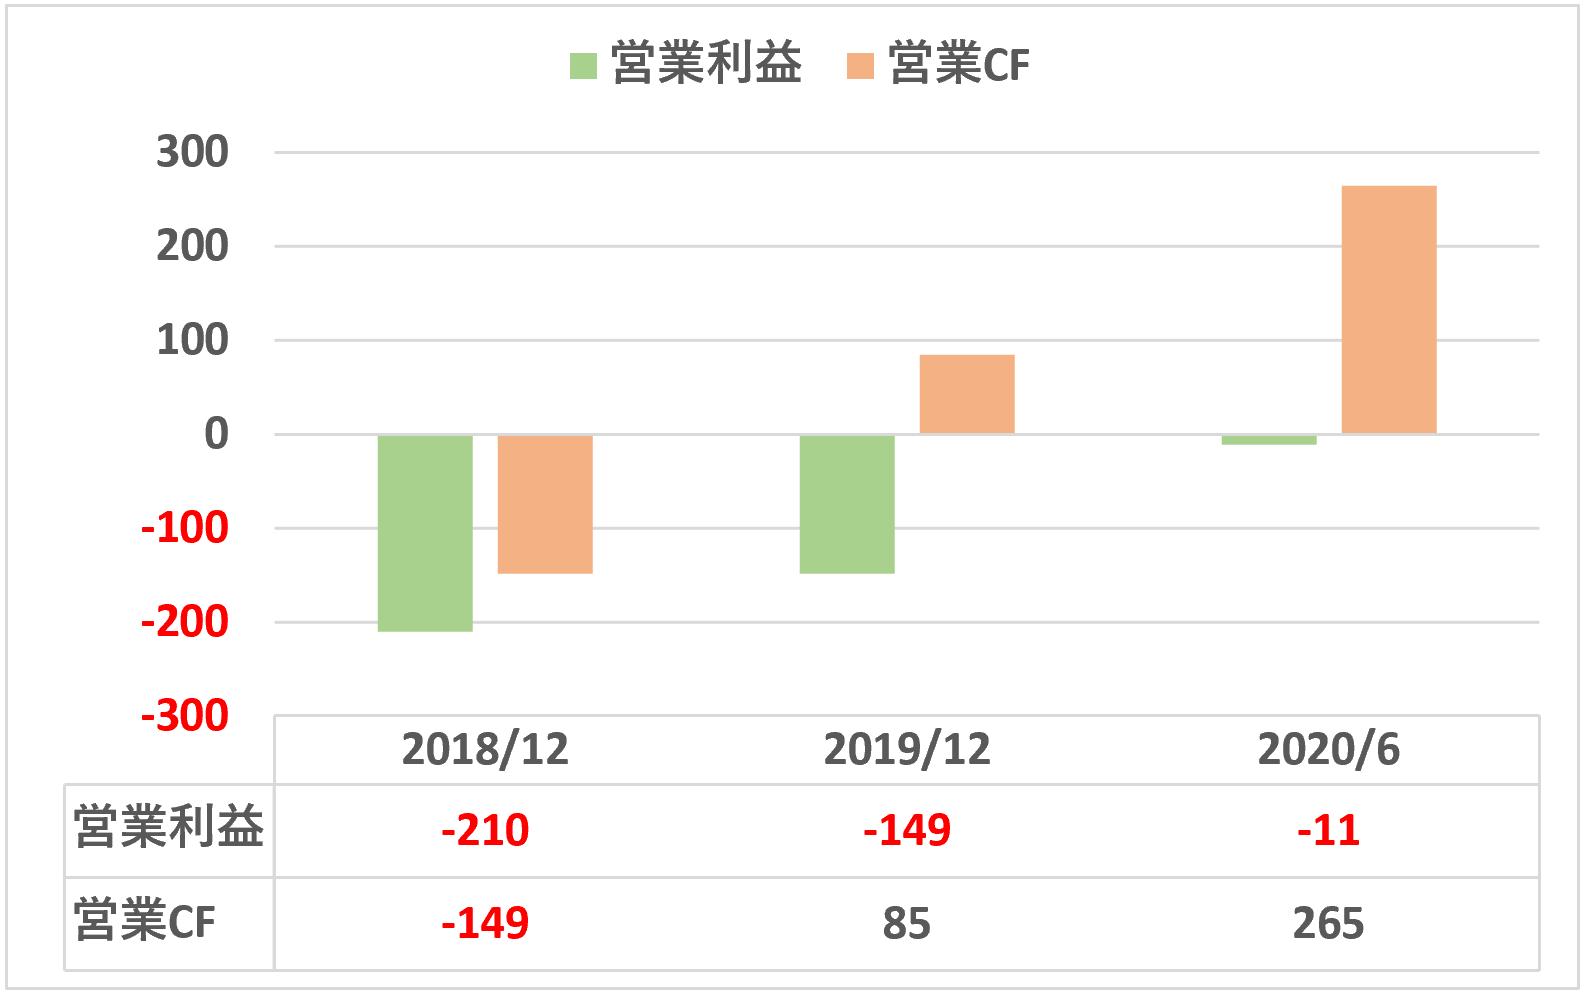 KIYOラーニング営業利益&営業キャッシュフロー推移